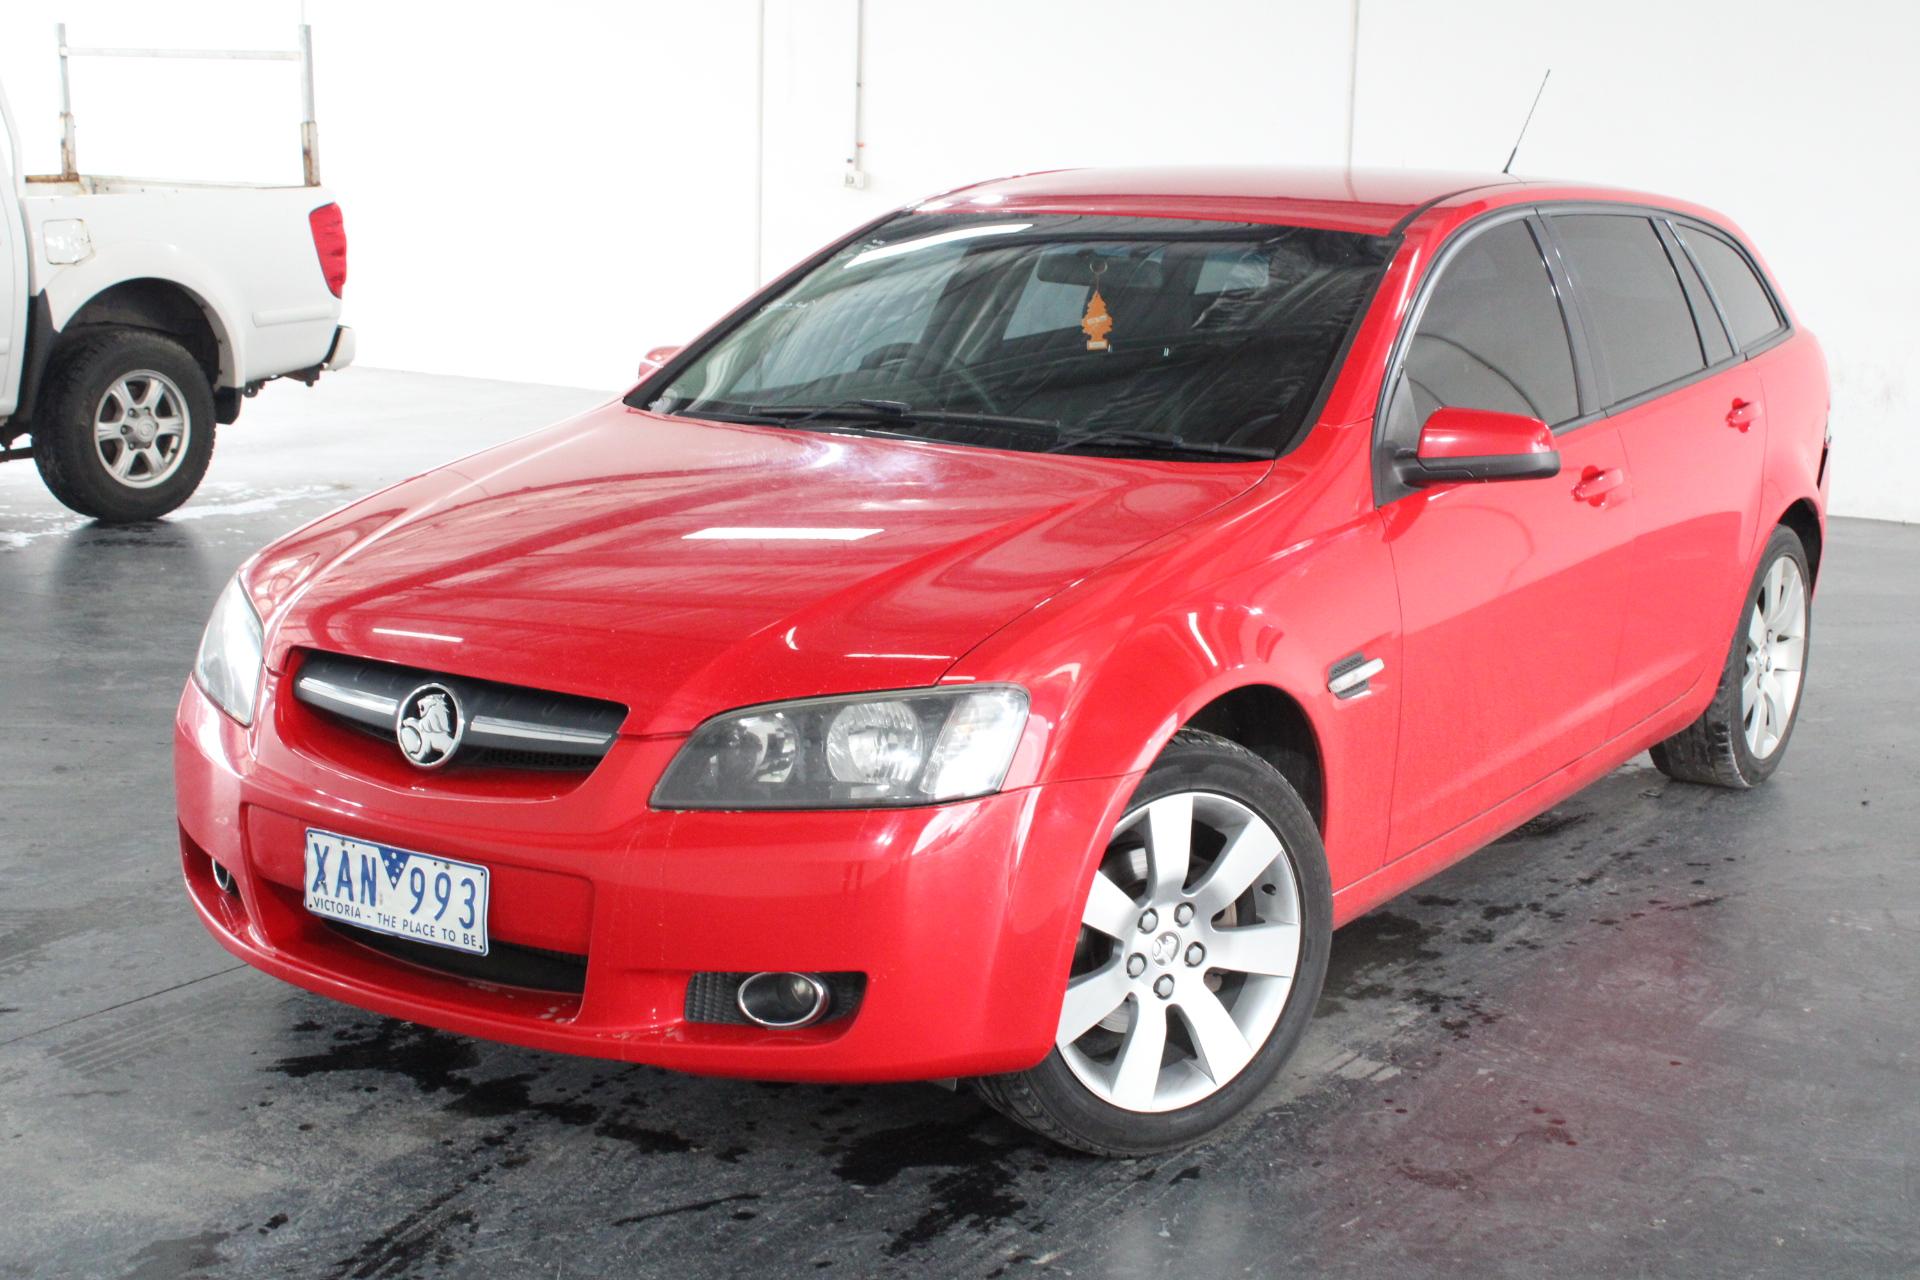 2009 Holden Commodore International VE Automatic Wagon